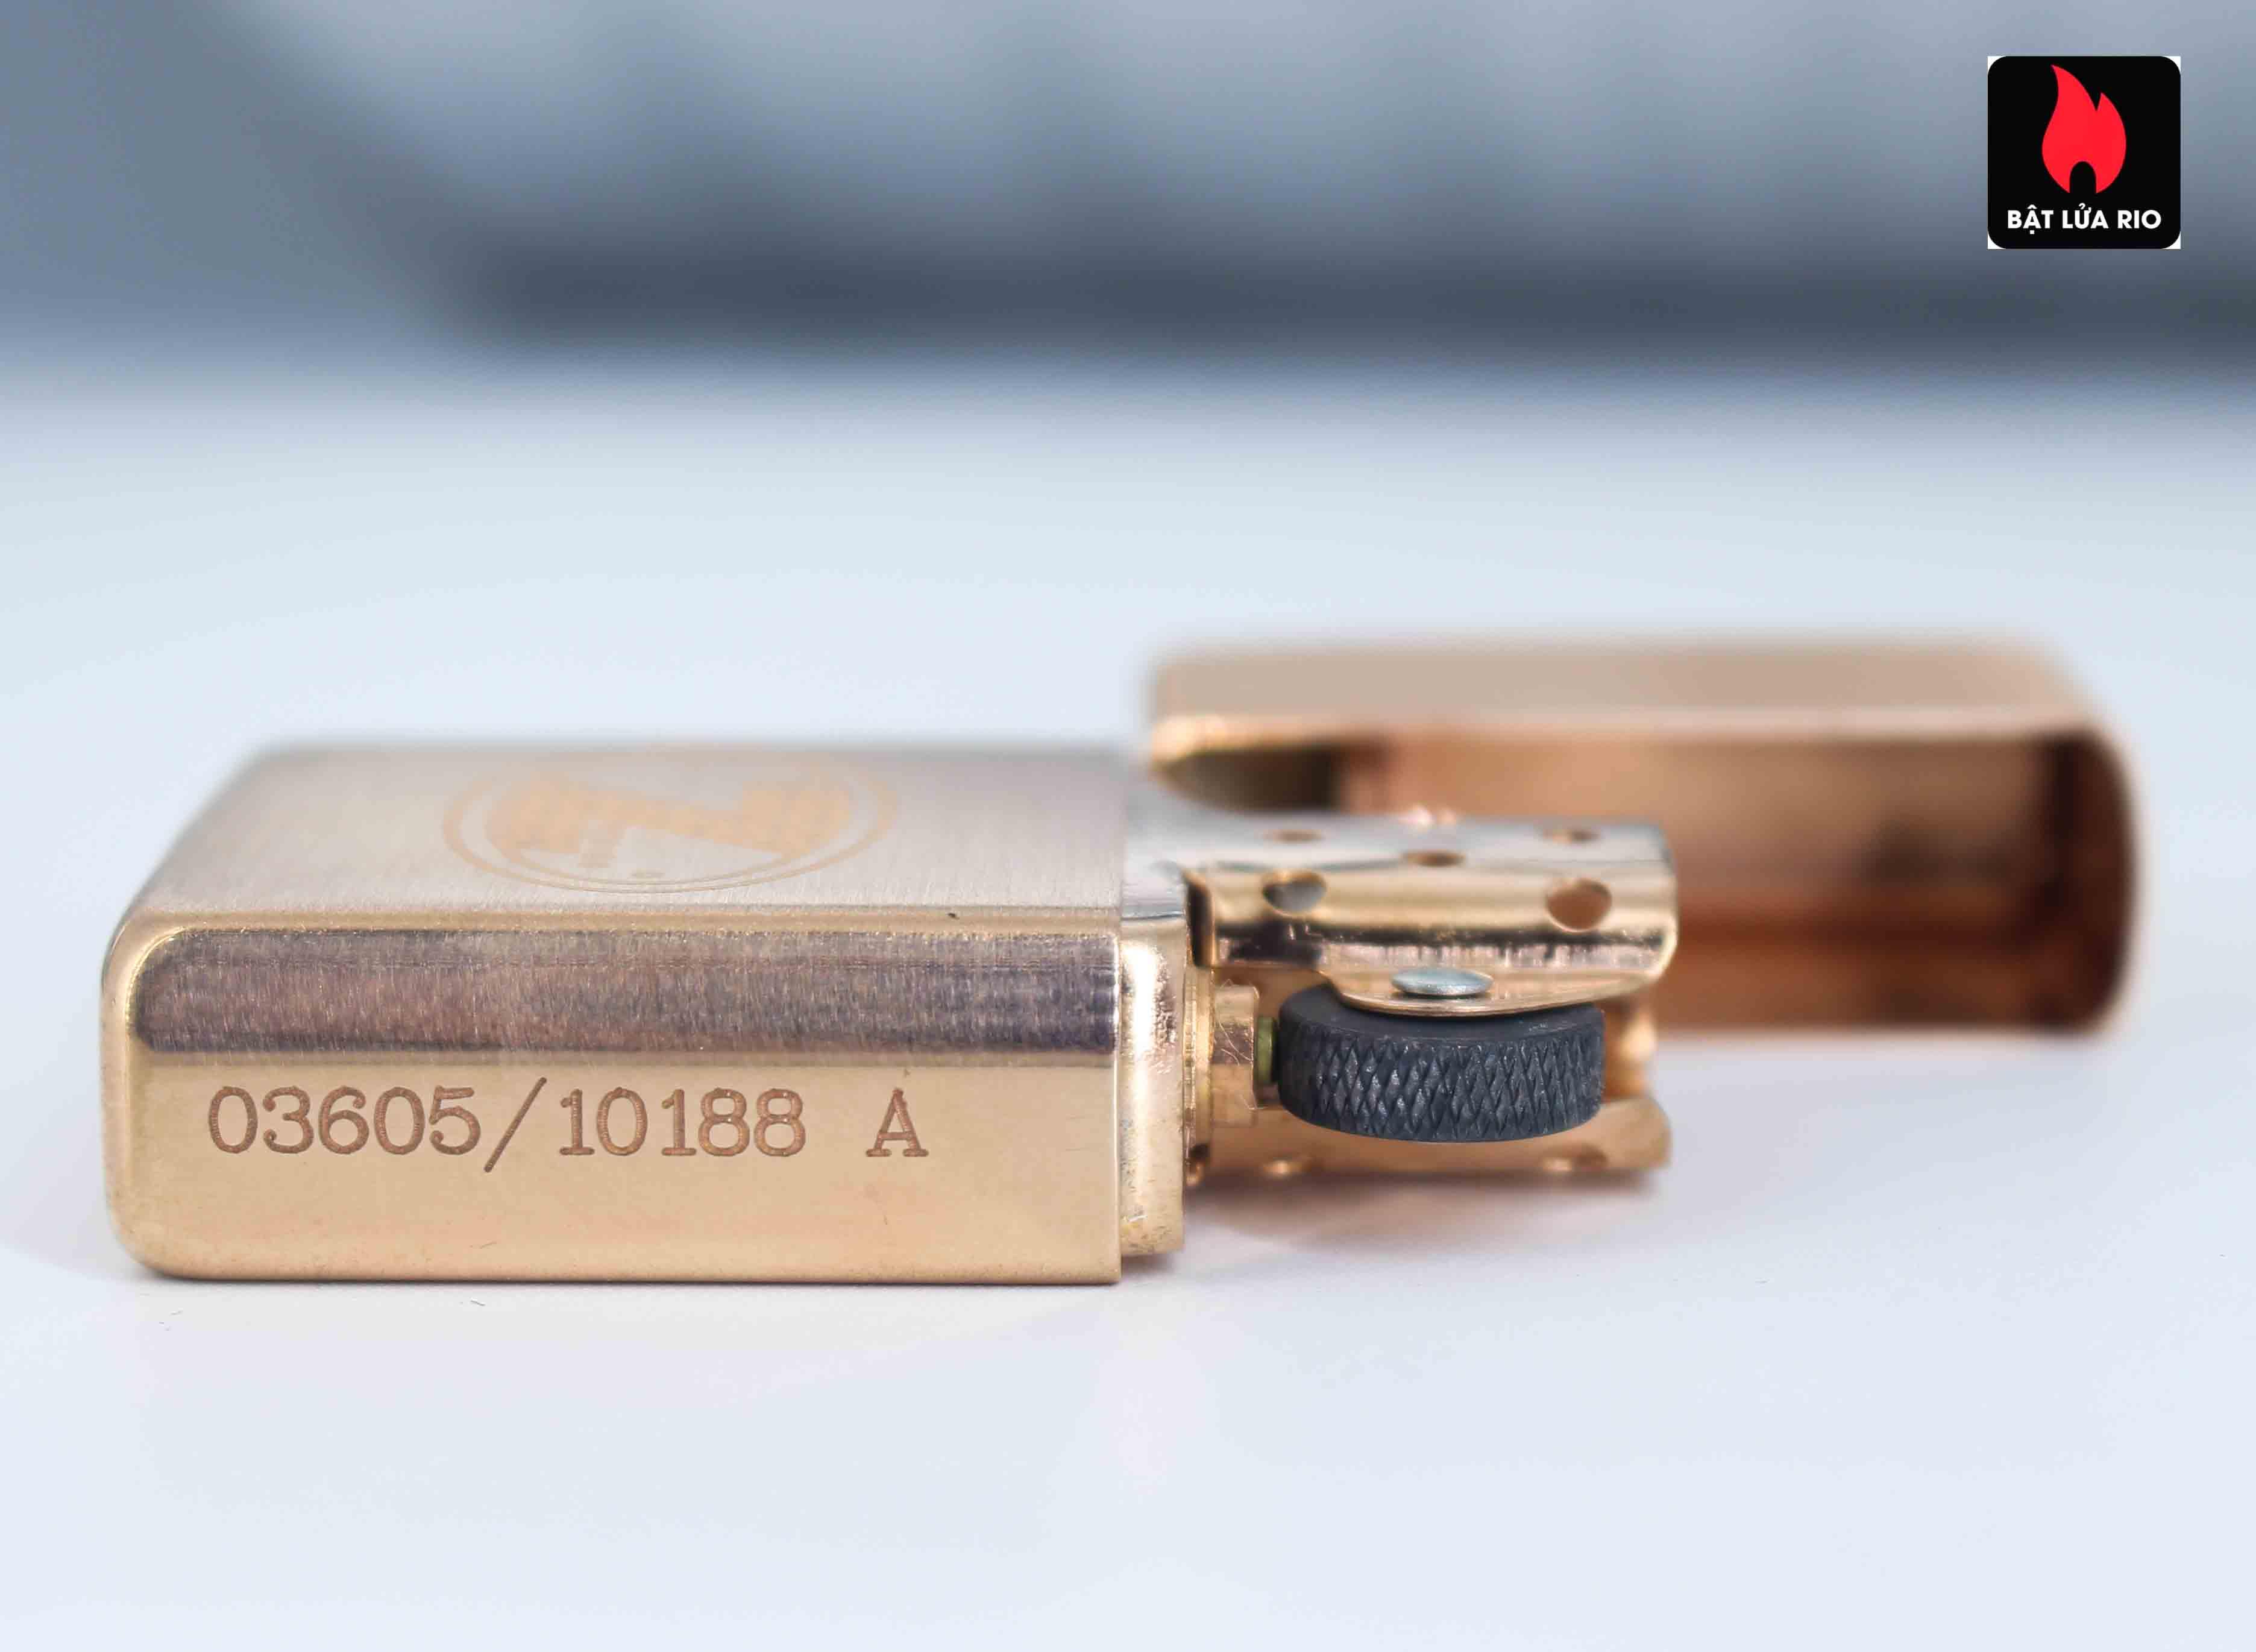 Zippo 2002 – Zippo Z-Series Copper Project – USA - Limited 03605/10188 A 5